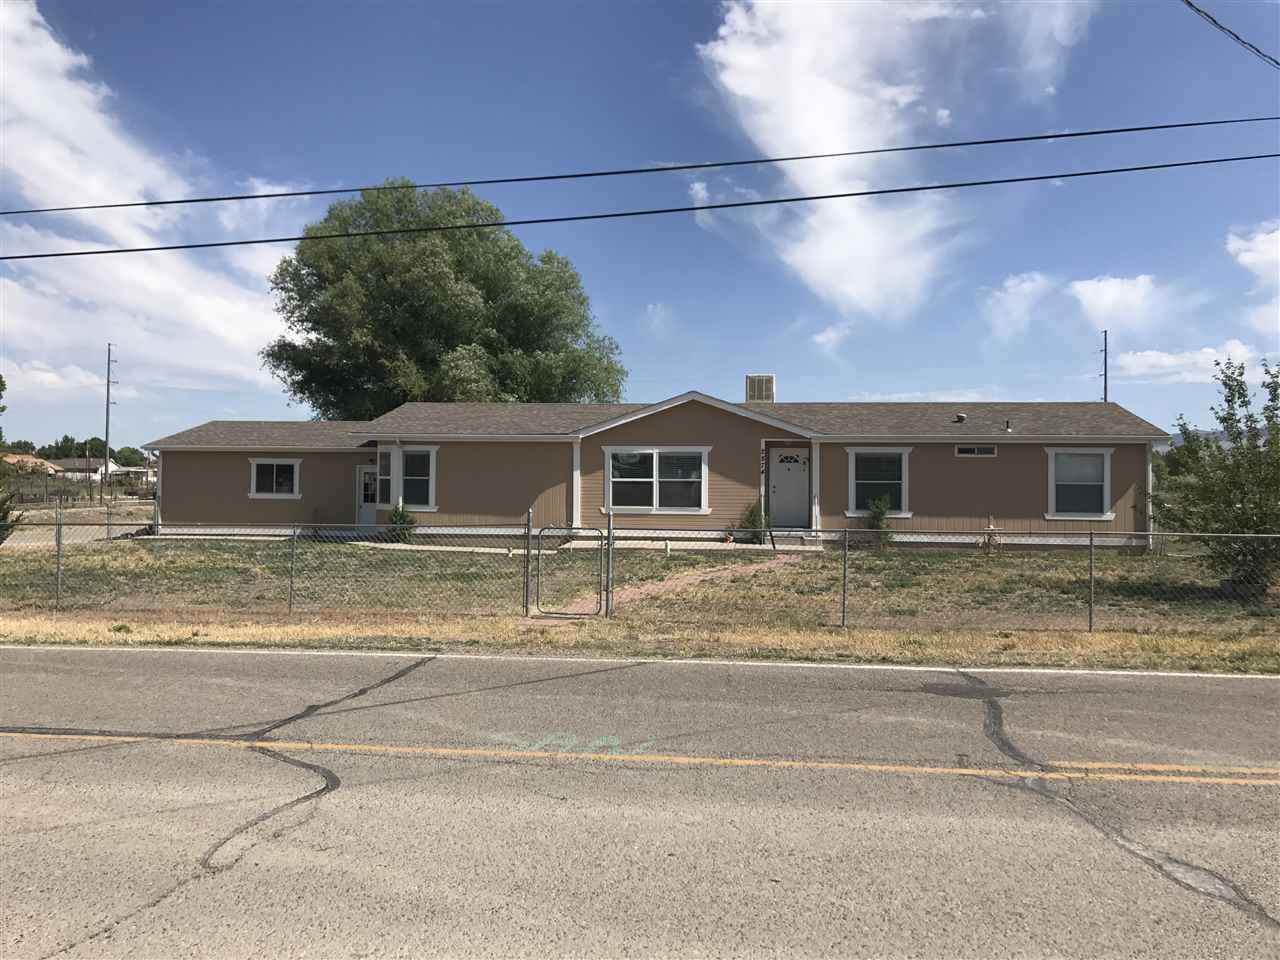 2874 C 1/2 Road, Grand Junction, CO 81501